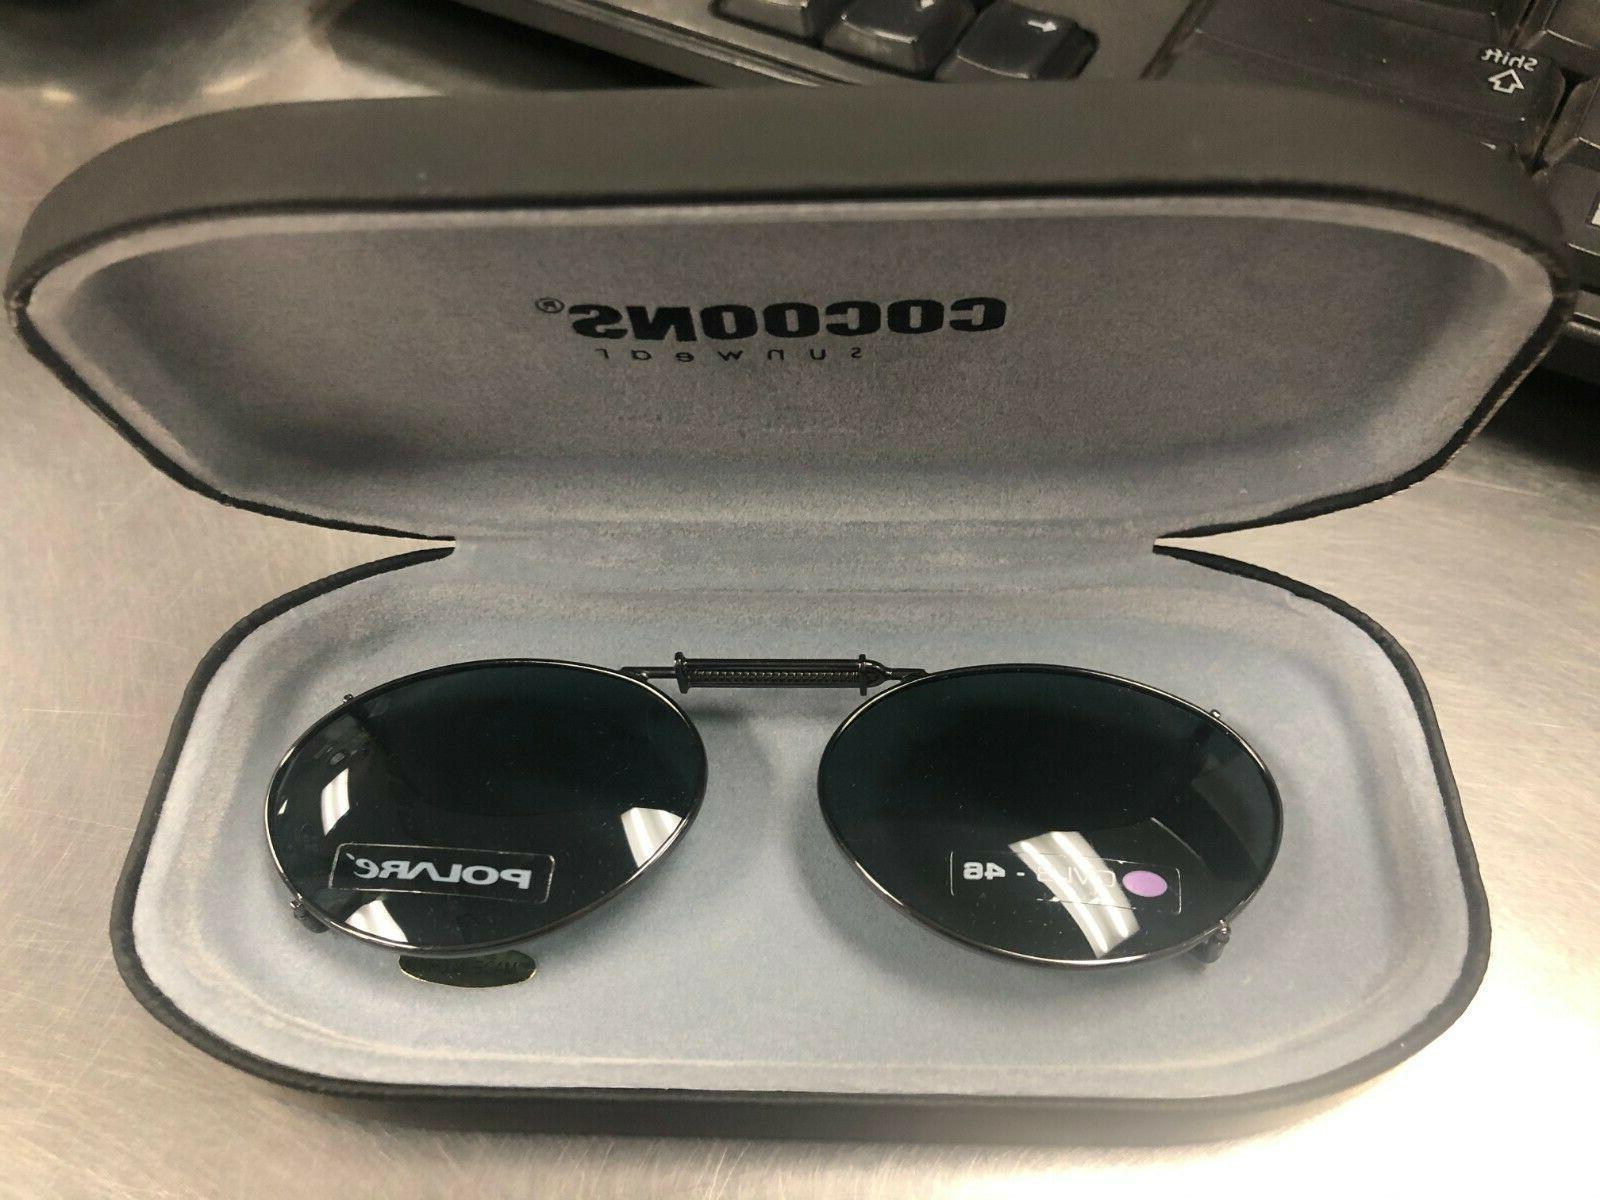 clip on sunglasses ov3 46 gunmetal